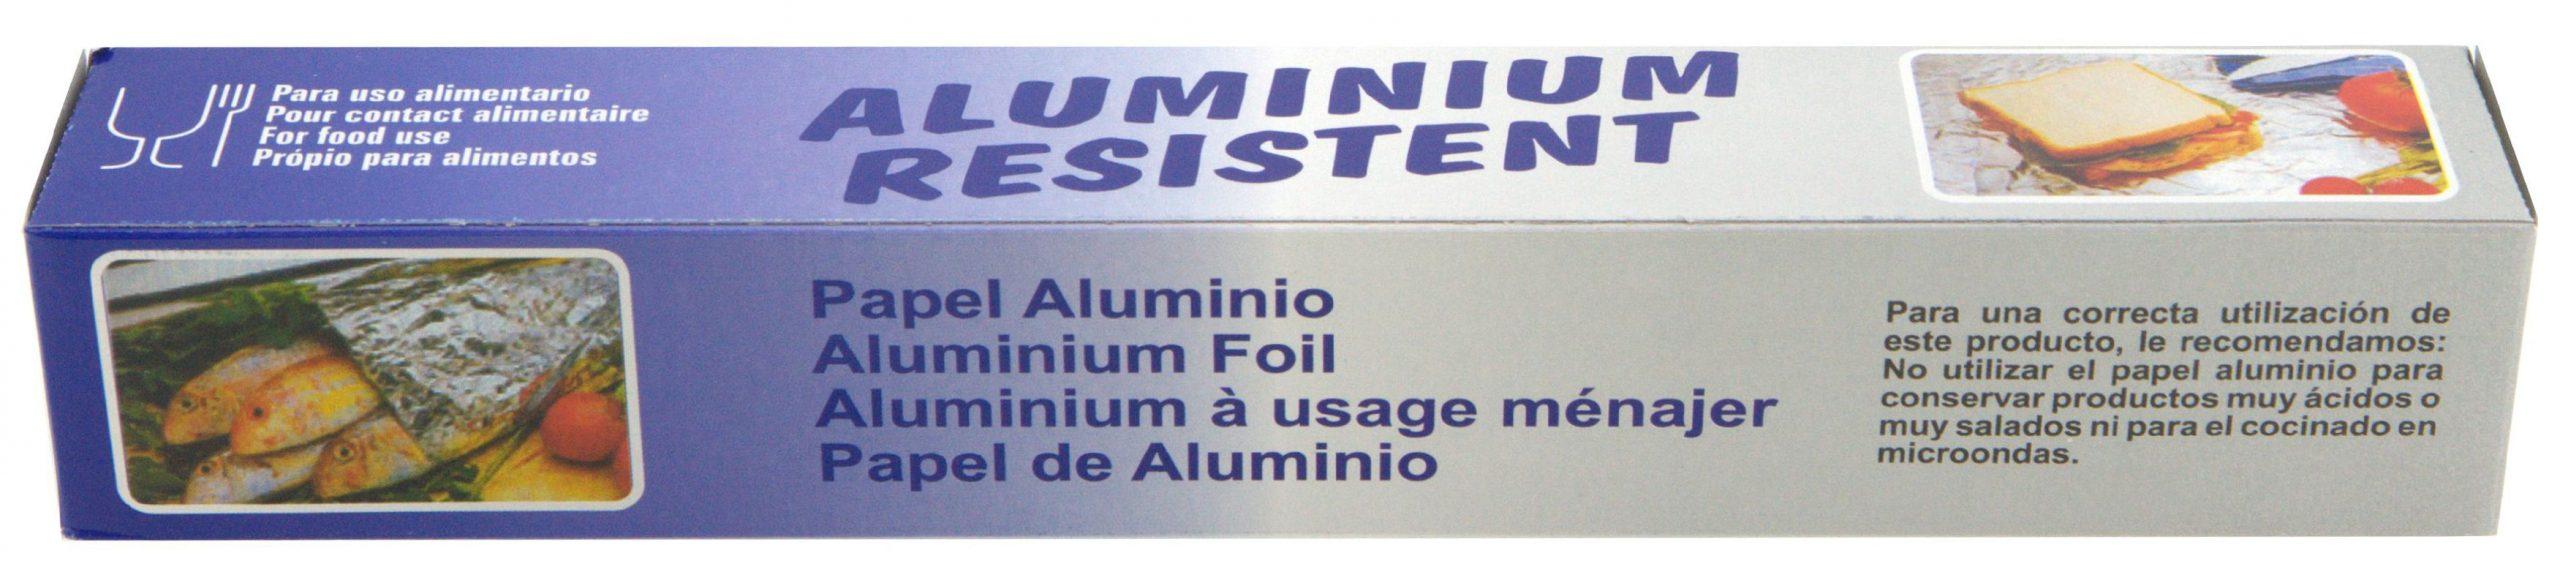 PAPEL ALUMINIO R-50